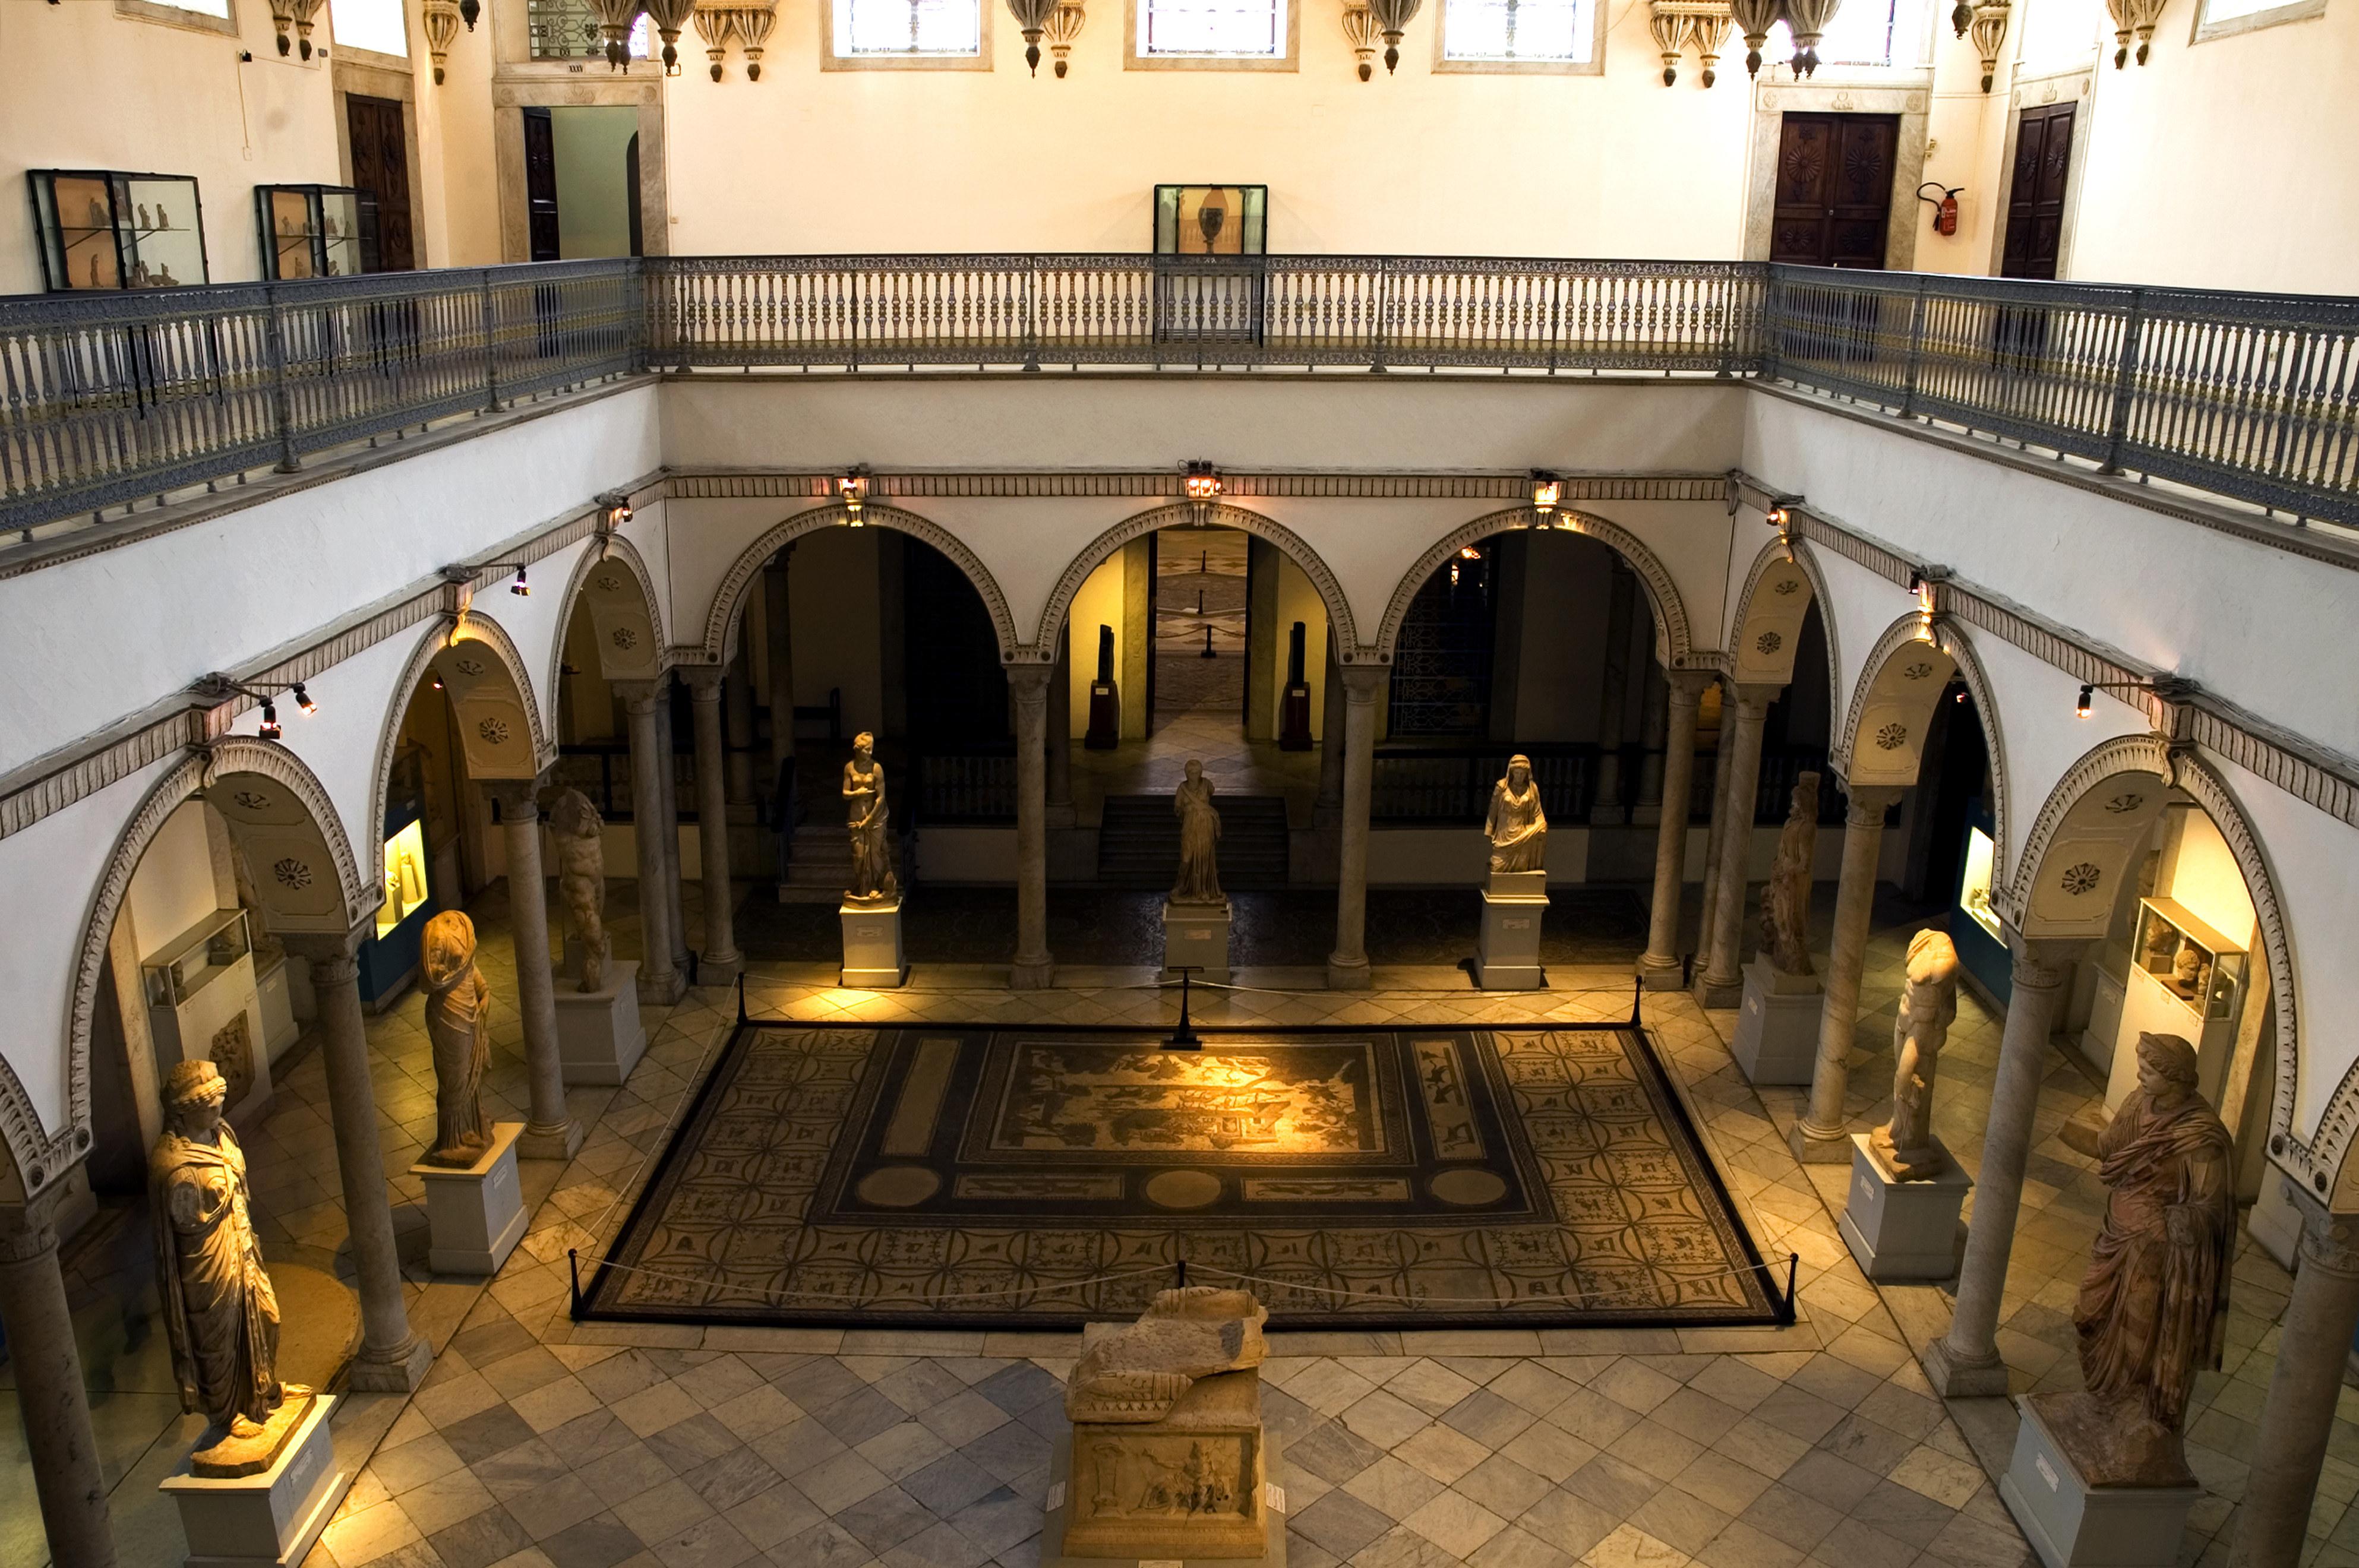 Bardo National Museum, Tunisia